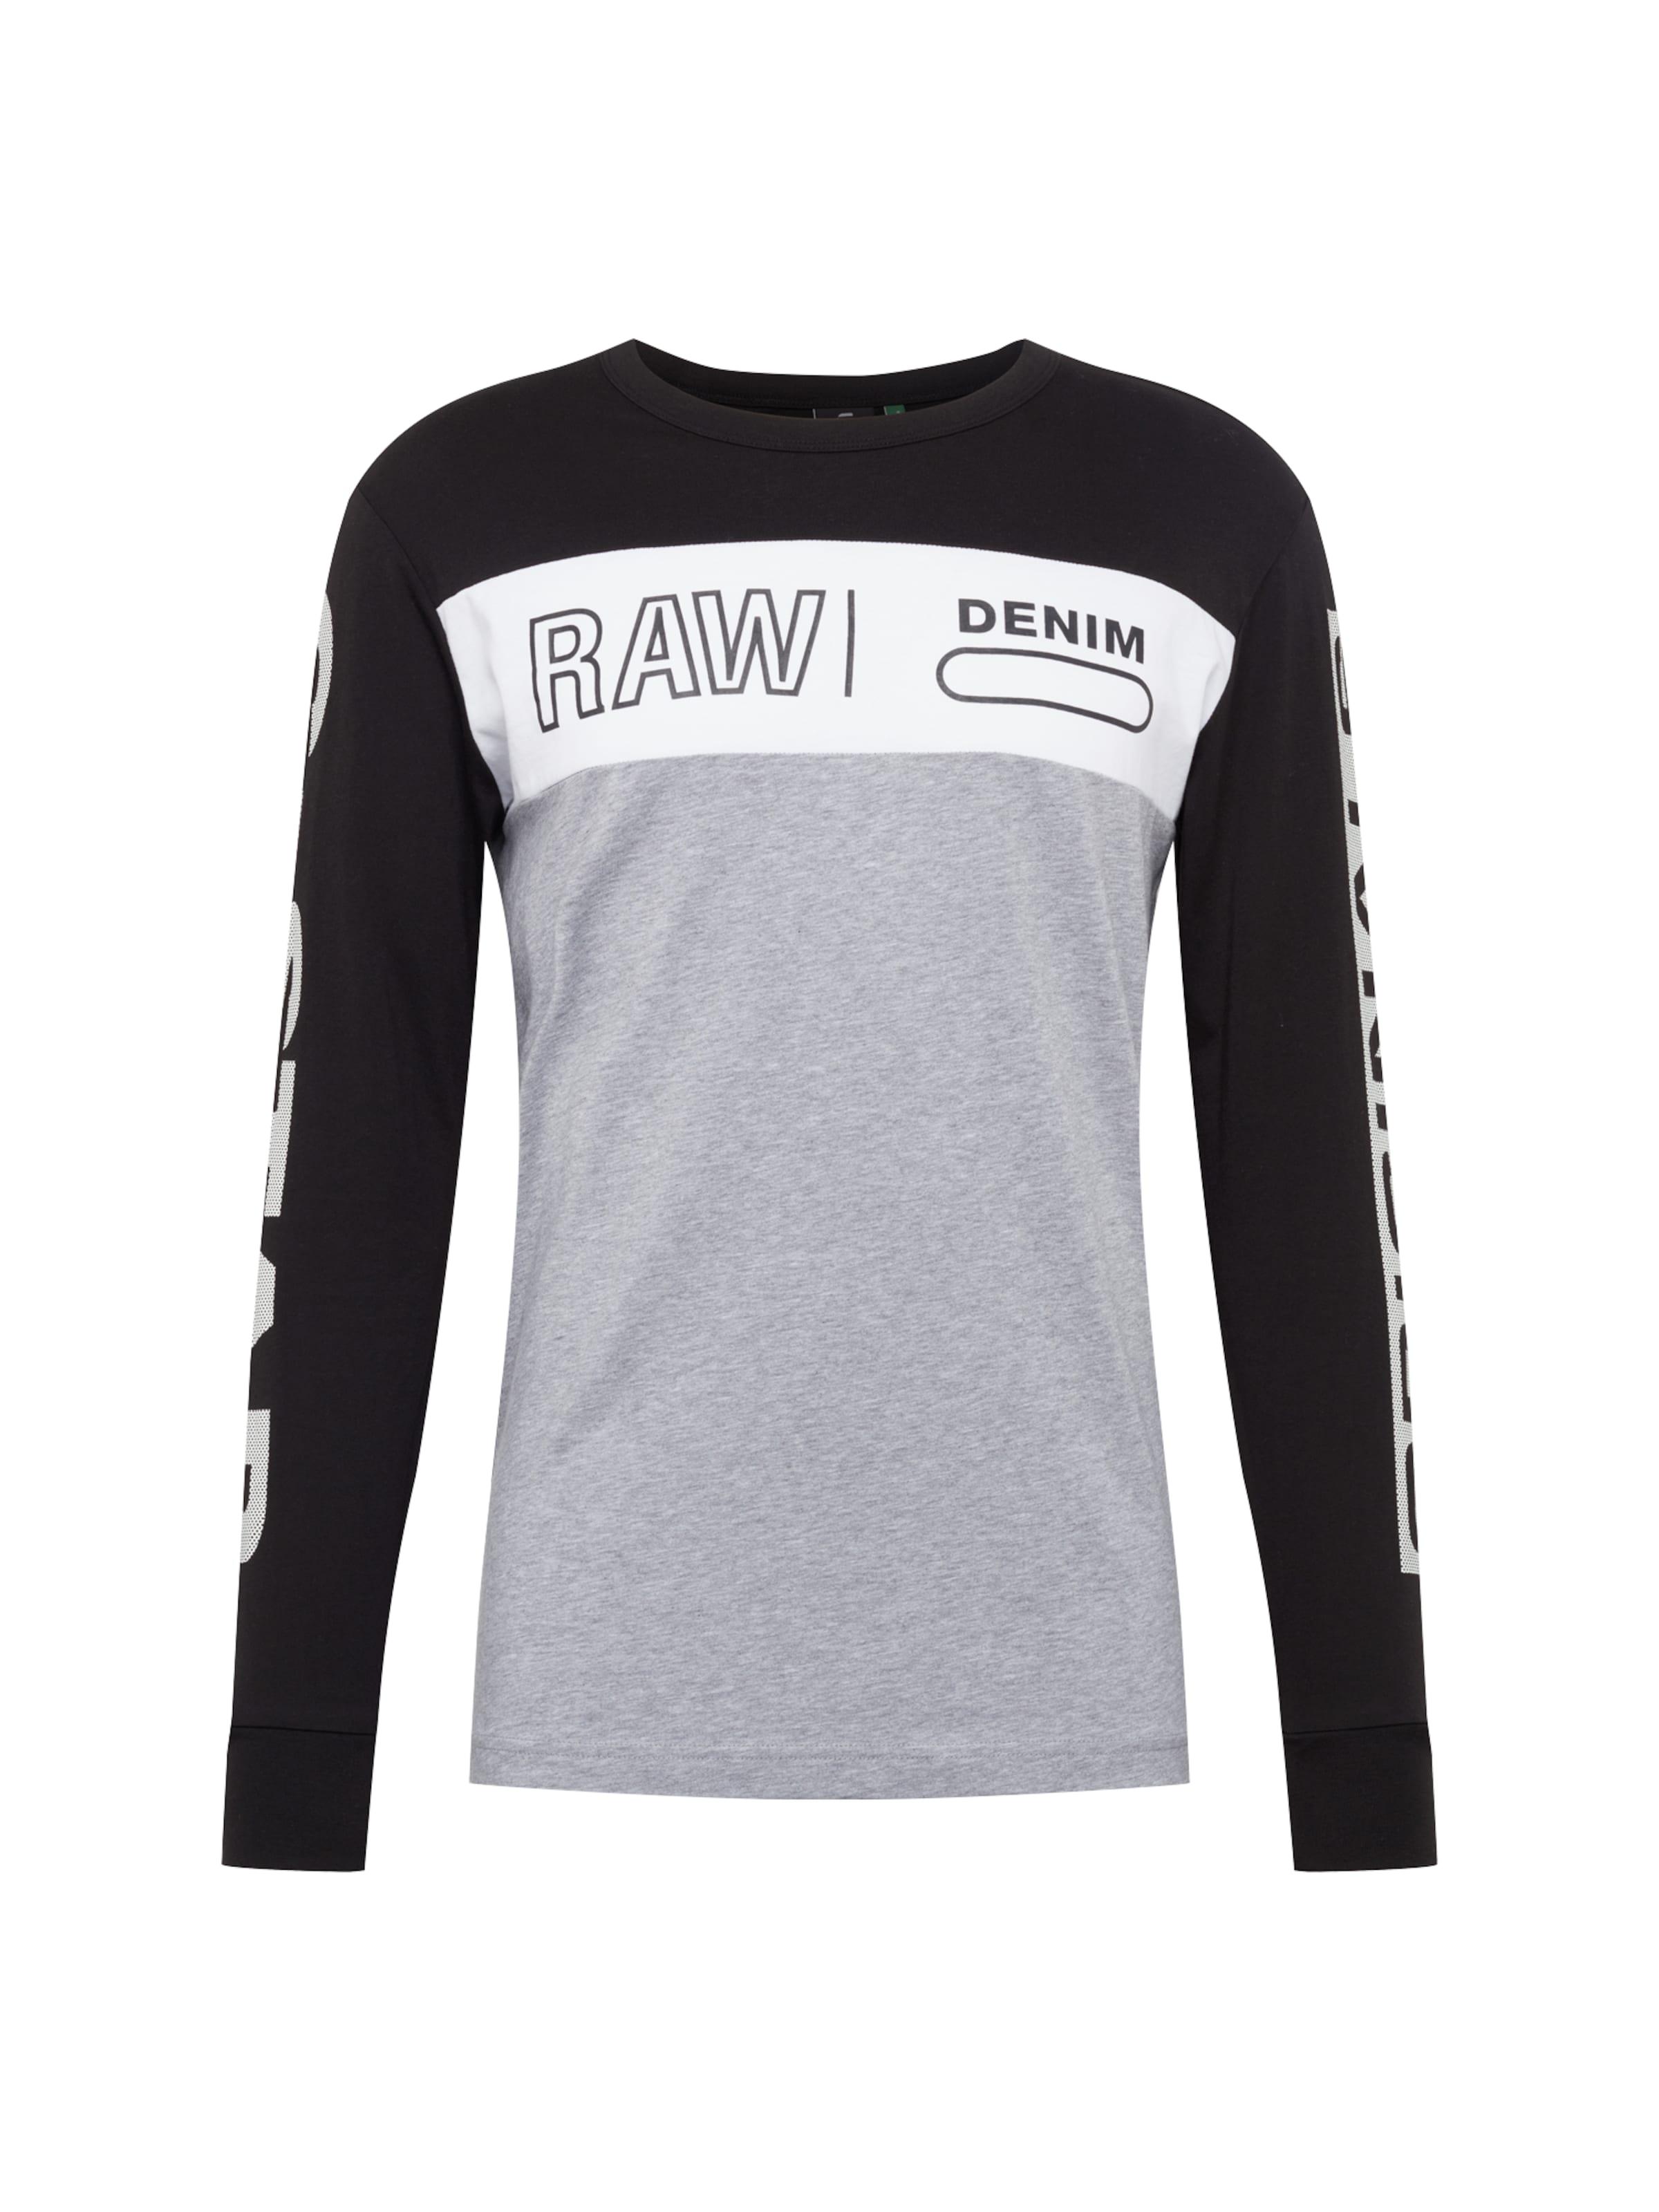 Block Ls' shirt Regular T In GrisNoir star 'swando Graphic R Blanc RawT G MjLqSGUpzV